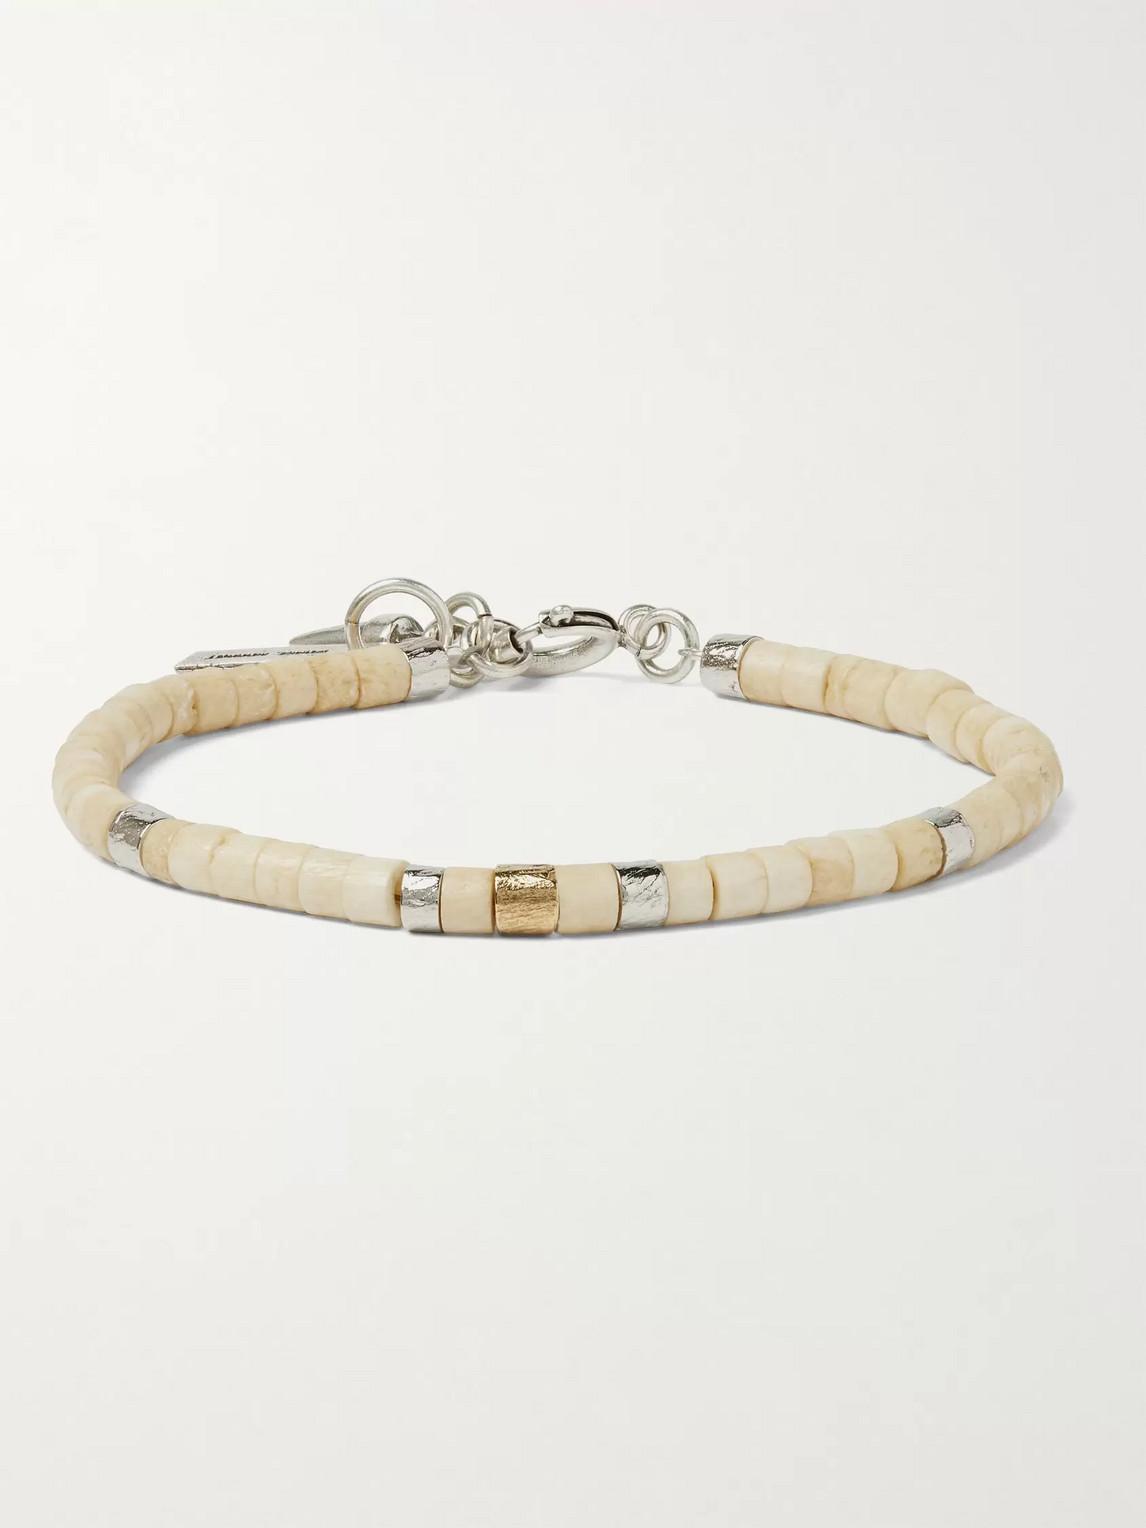 Isabel Marant Silver-tone And Bone Beaded Bracelet In Neutrals